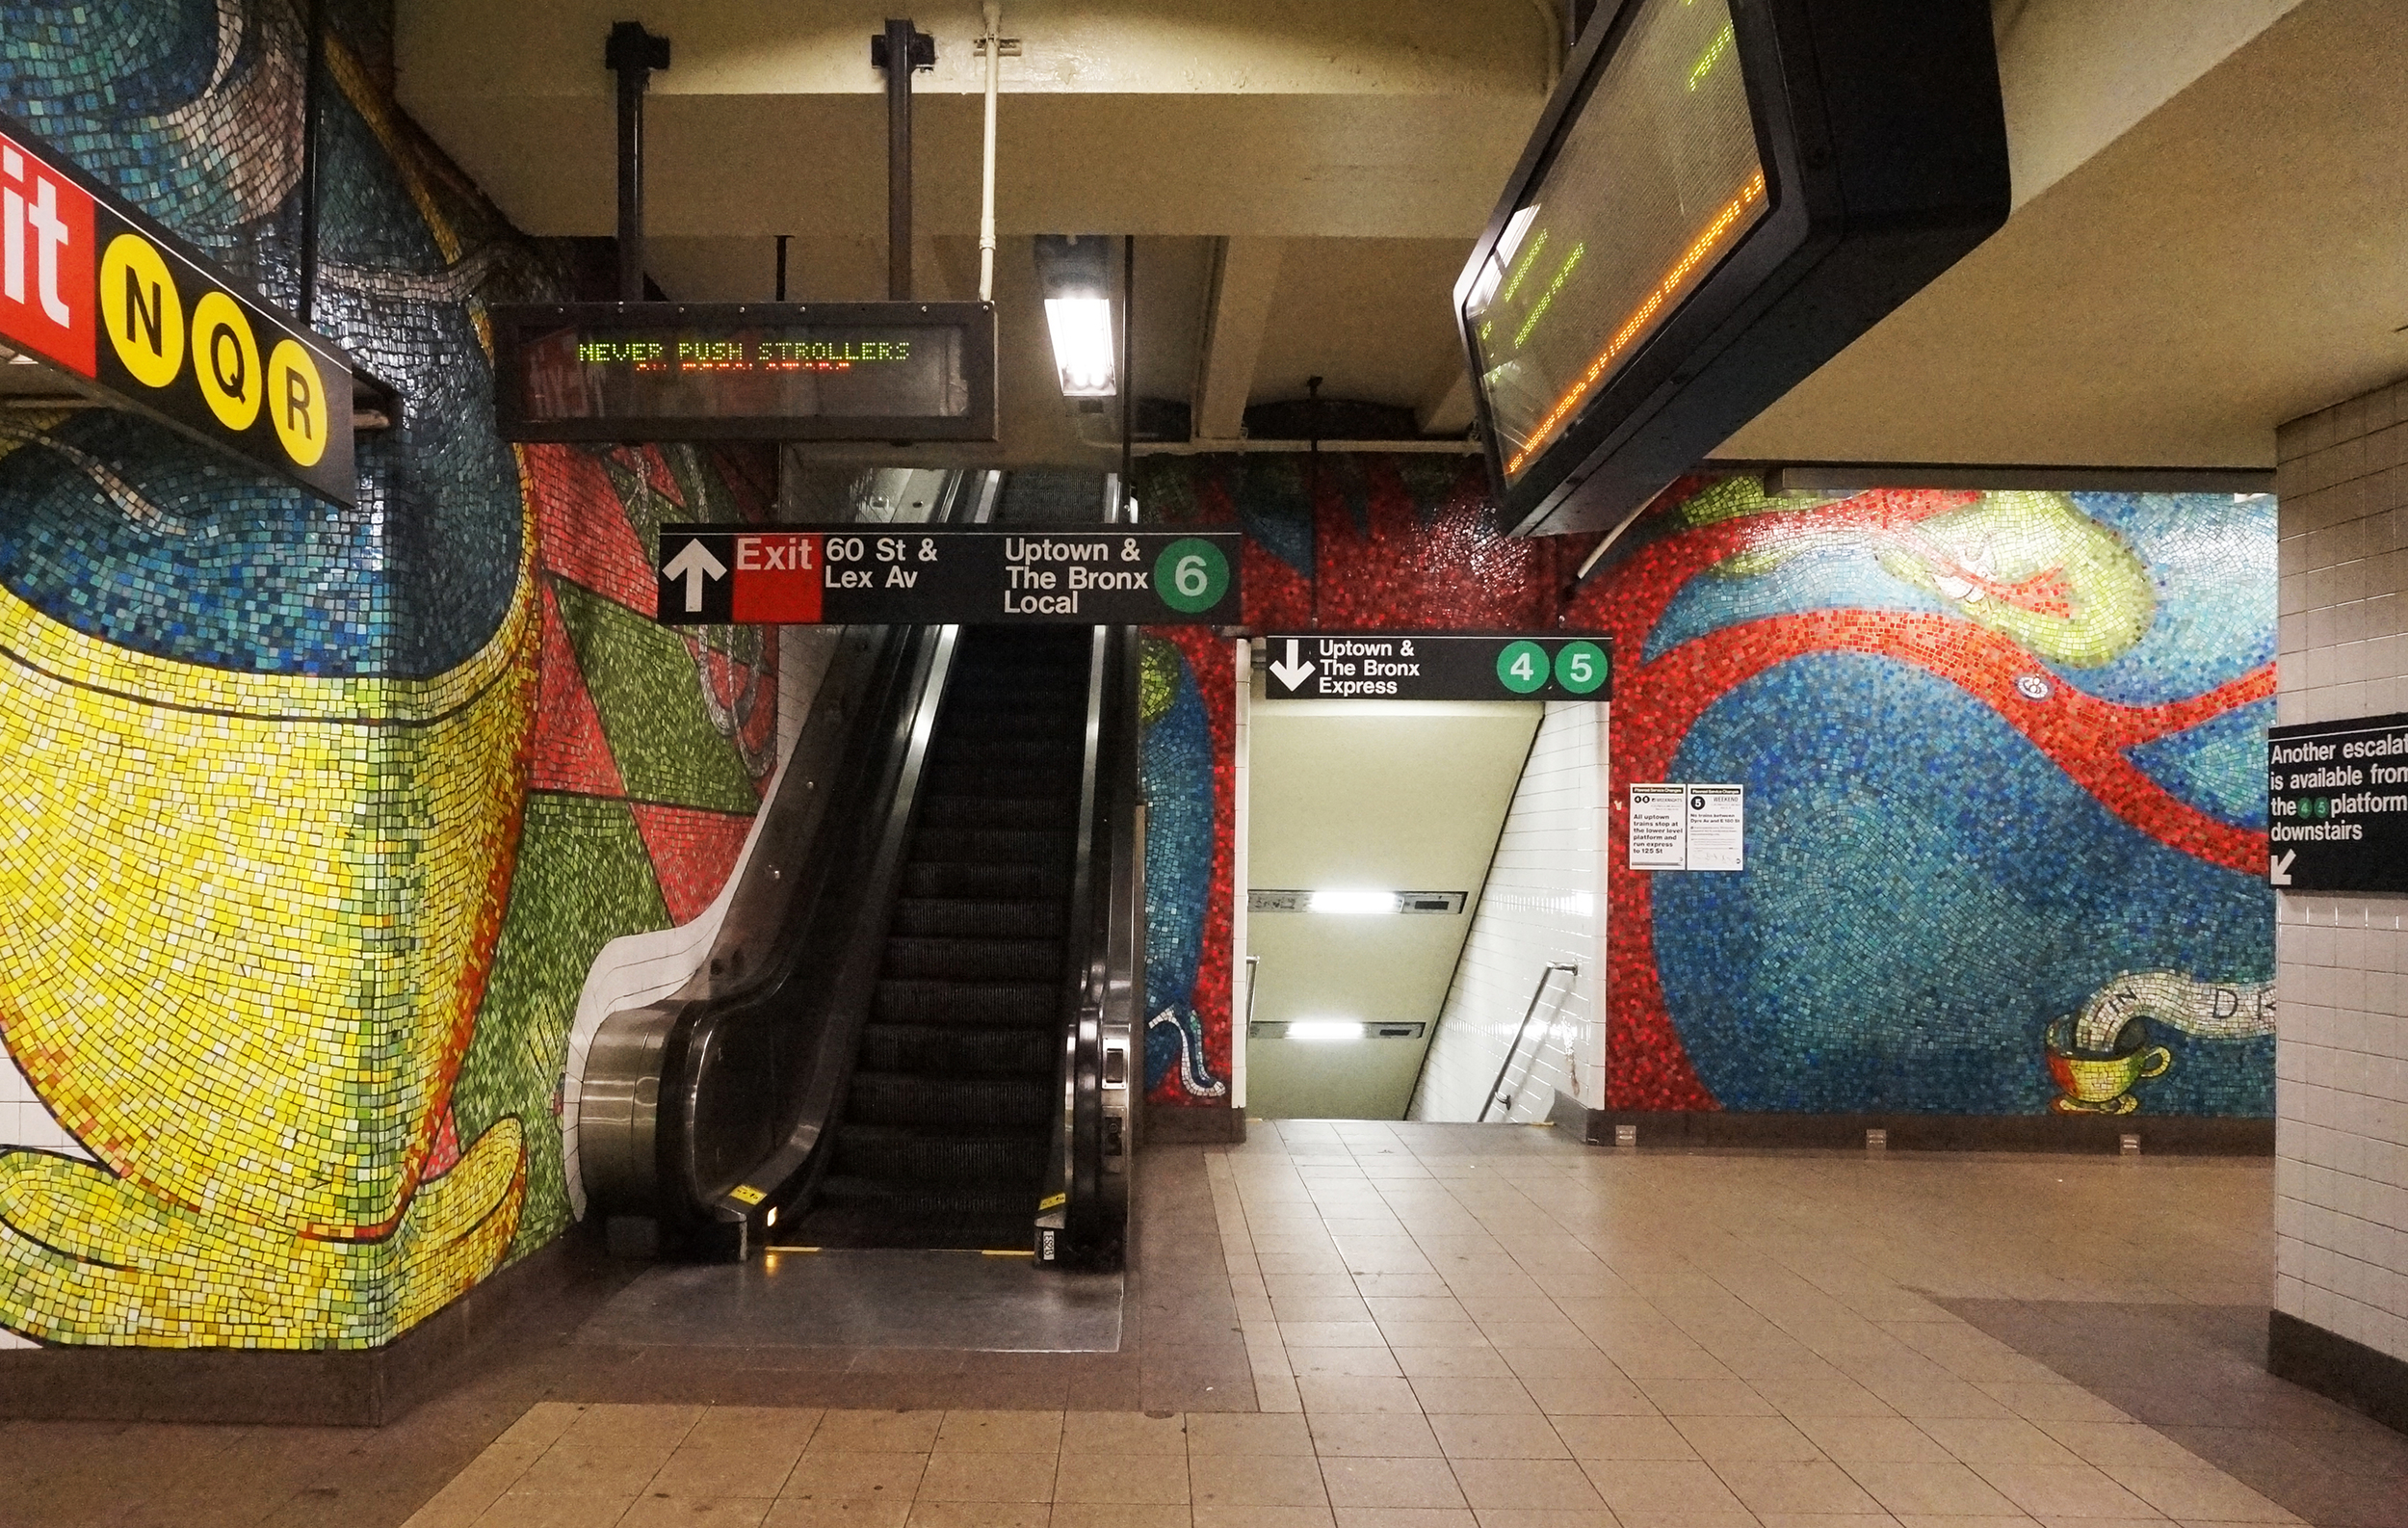 Lexington Avenue - 59th Street Snapshot 2